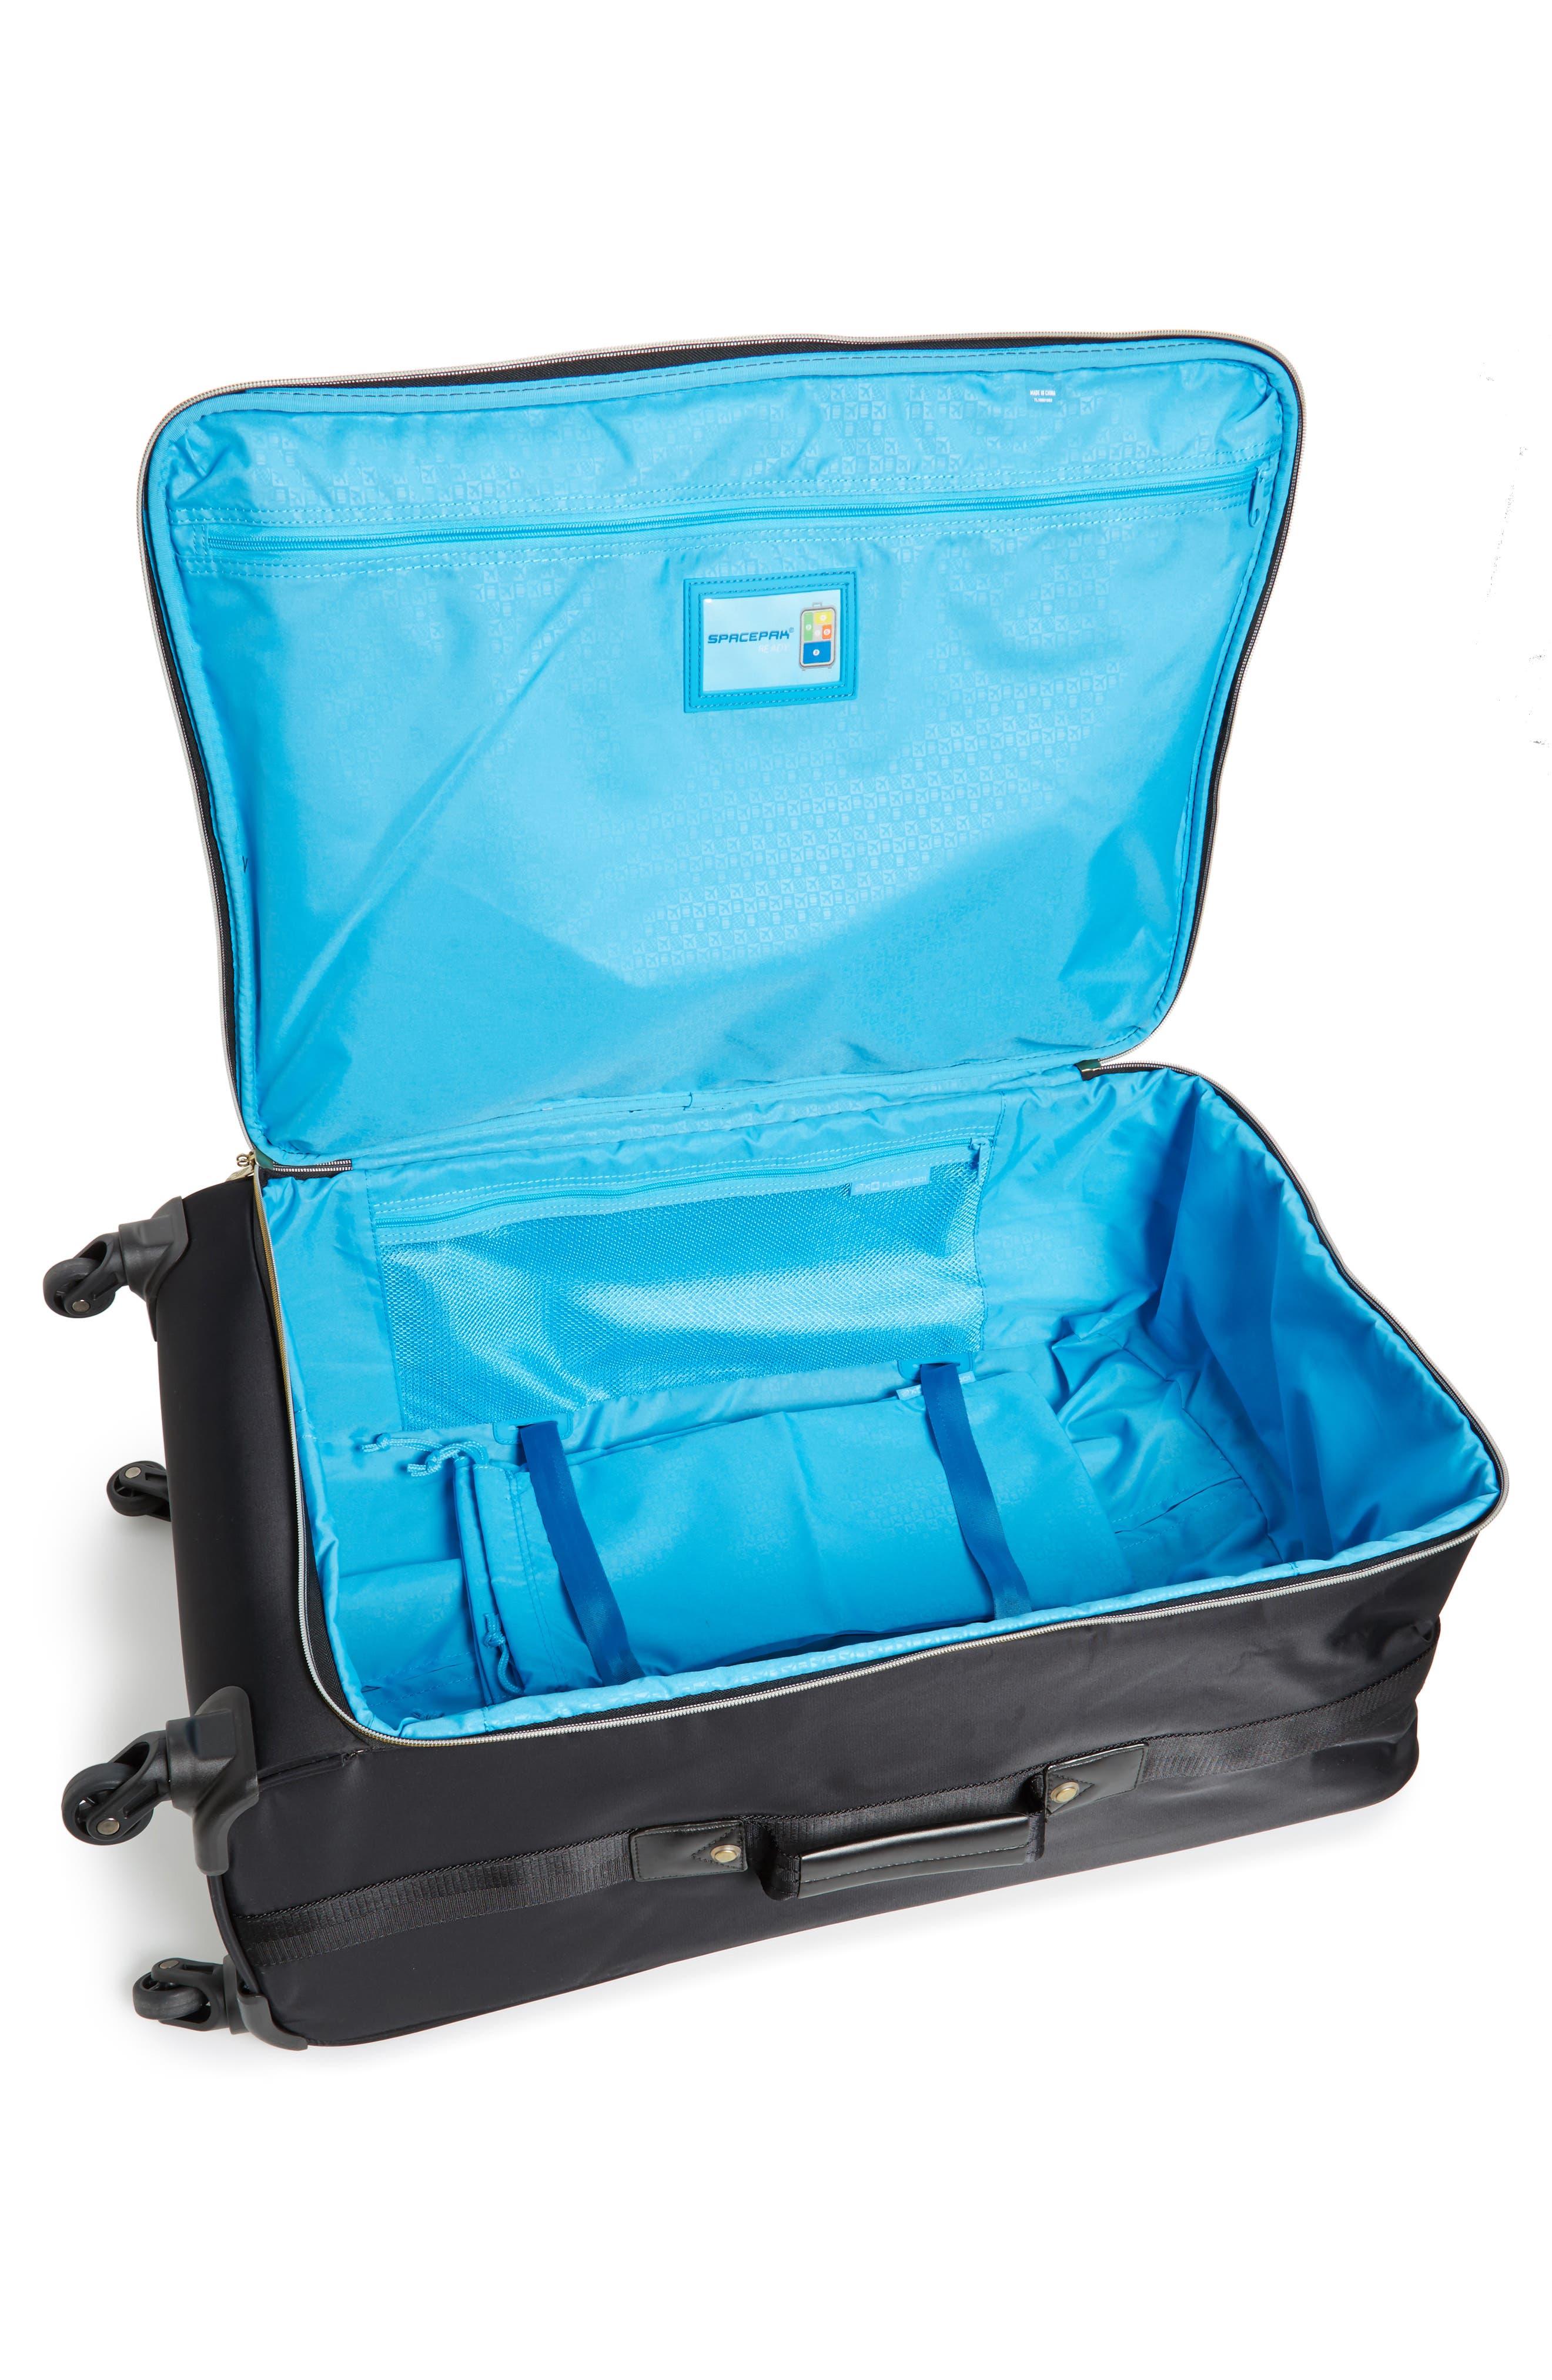 Alternate Image 3  - Flight 001 Avionette 26 Inch Rolling Suitcase